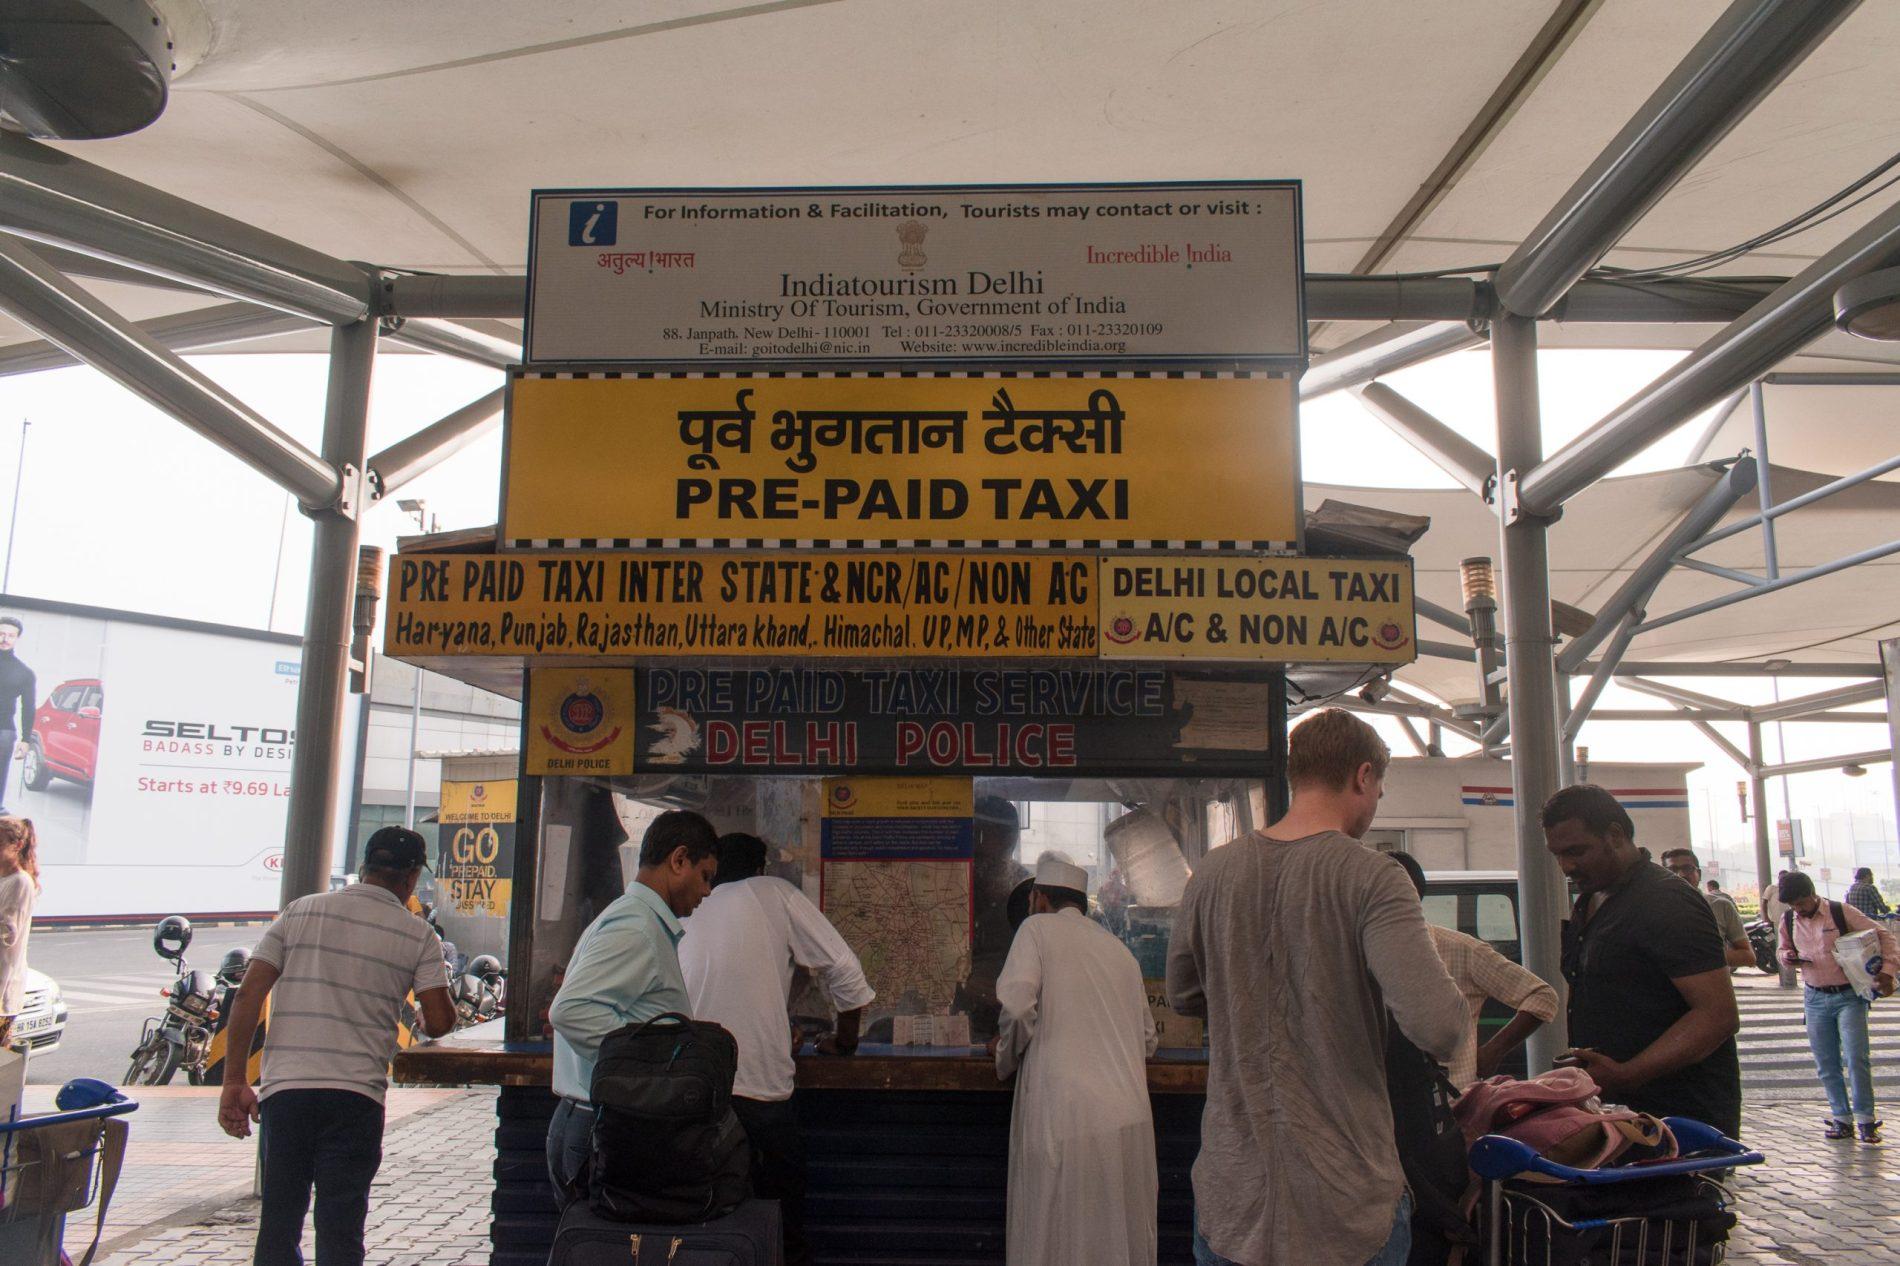 Aeroporto na Índia: dicas